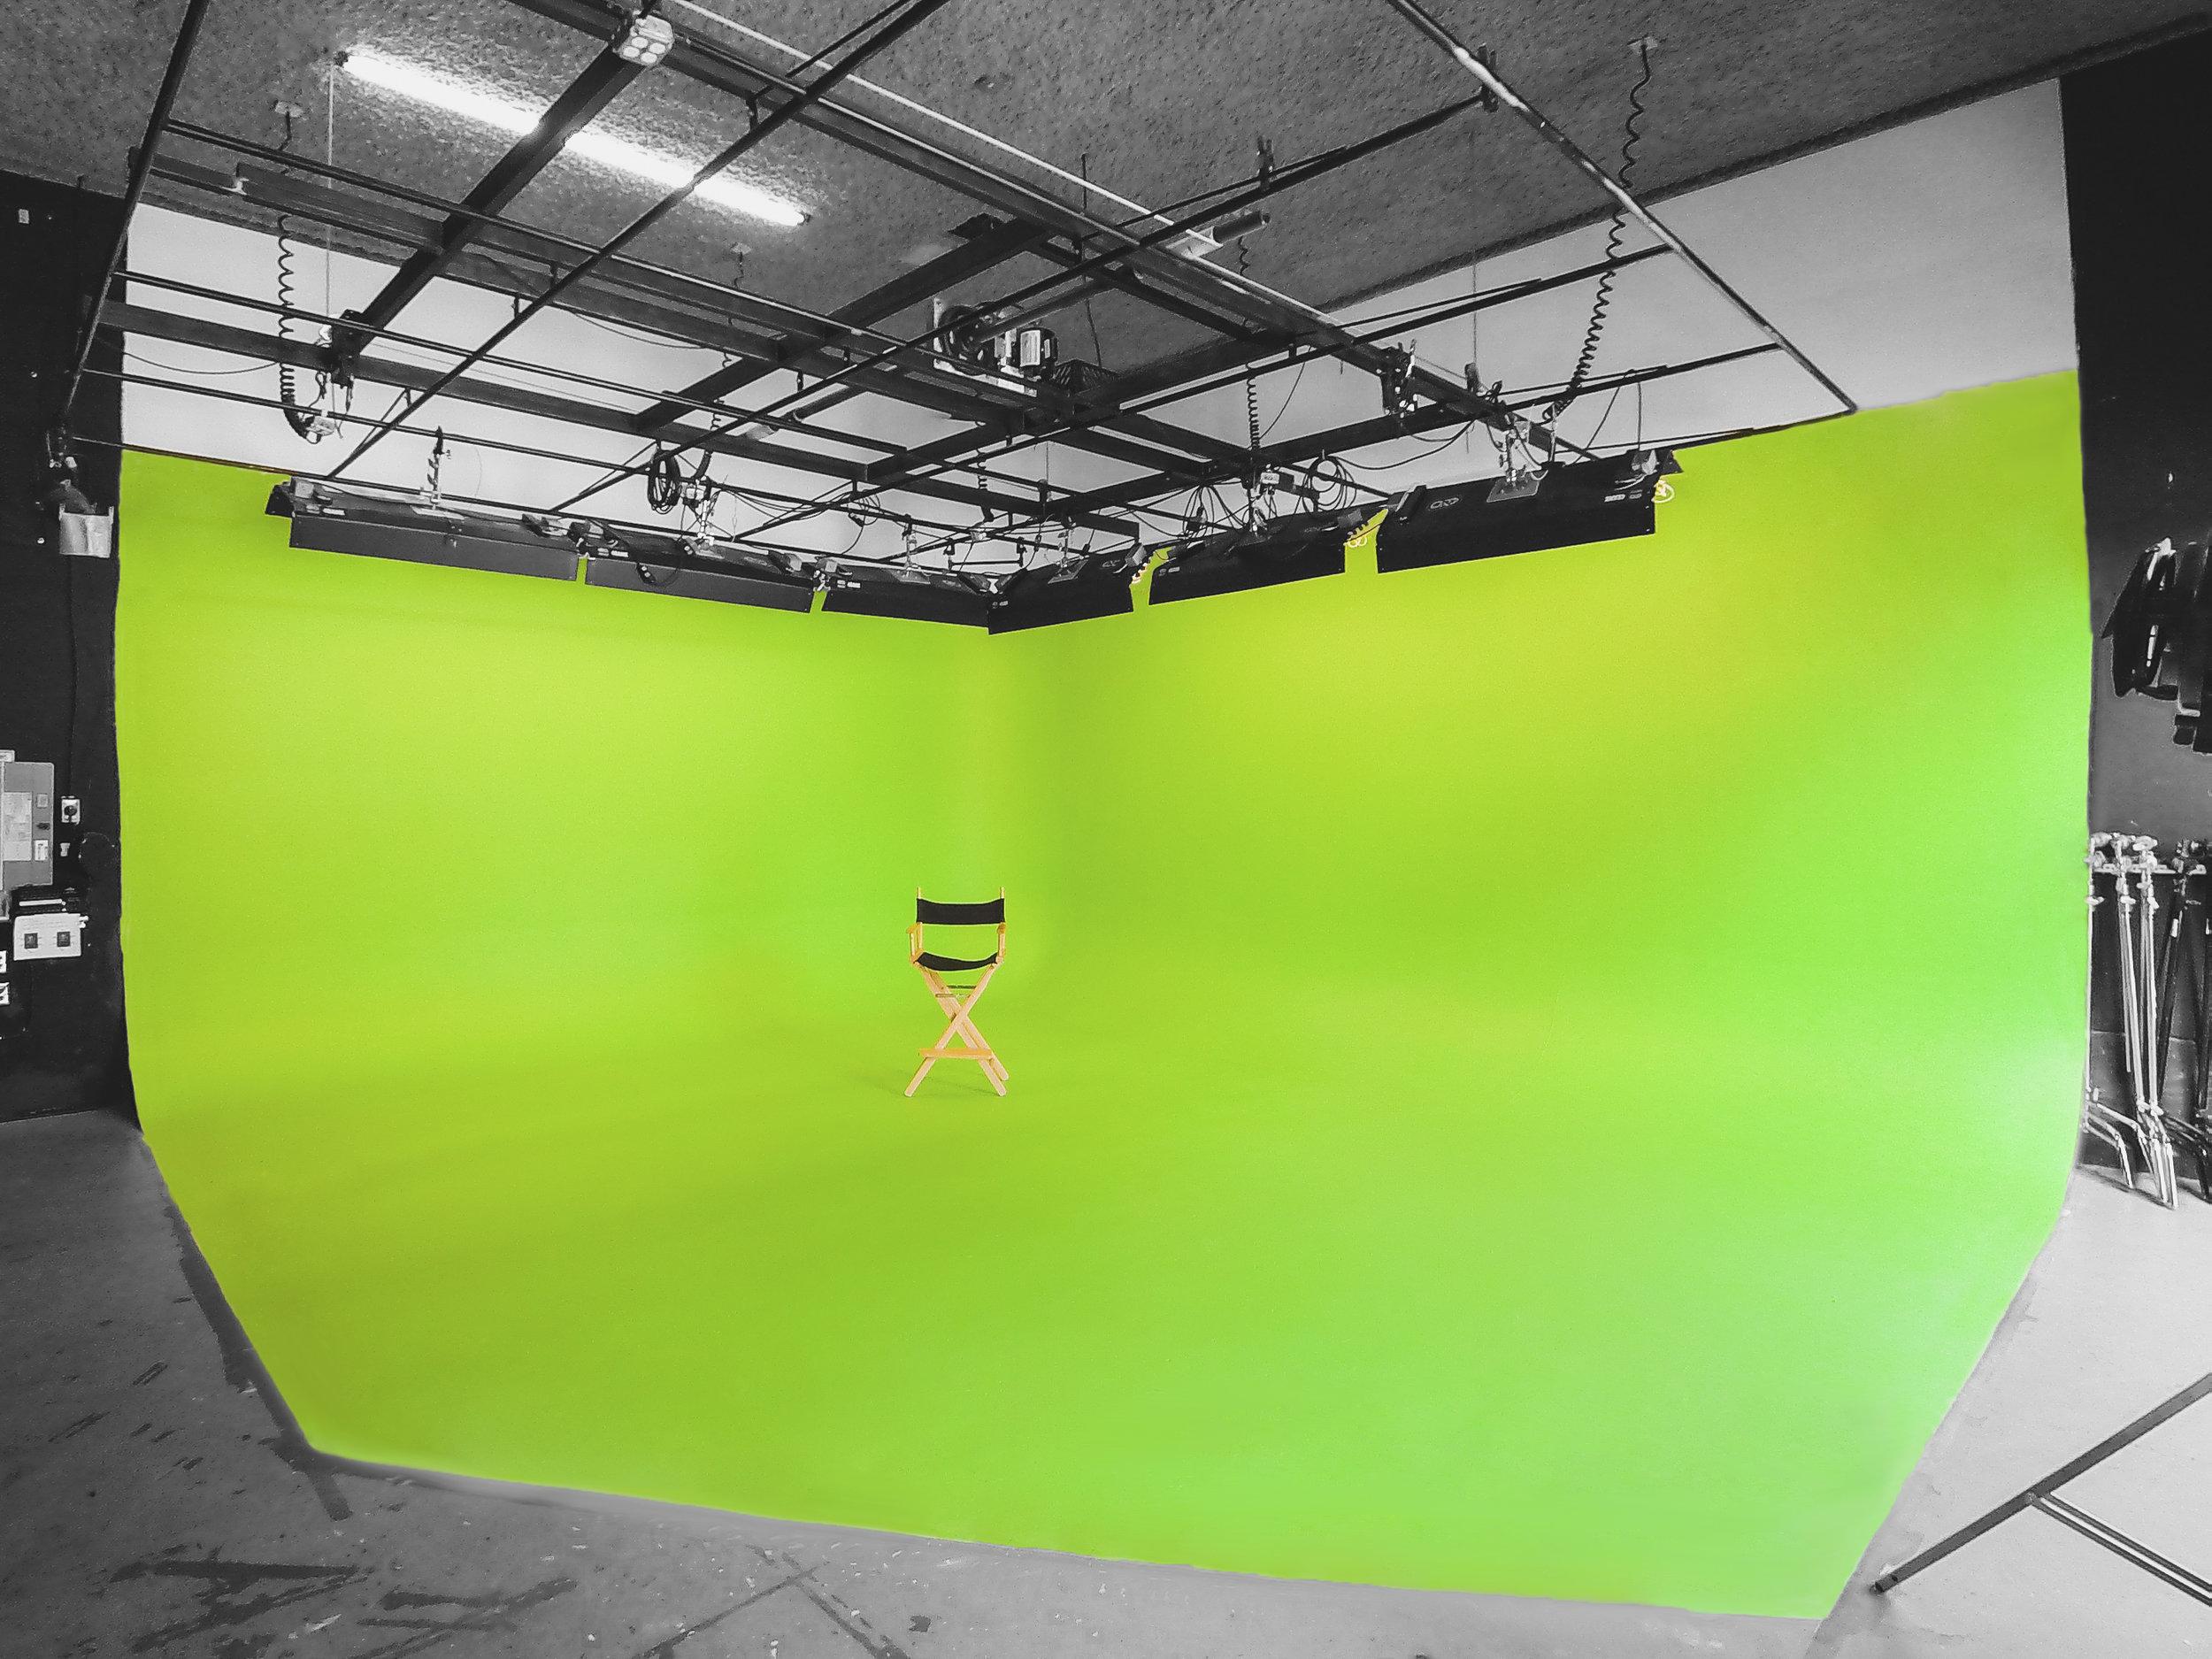 The studio at Originator features green screen capabilities.